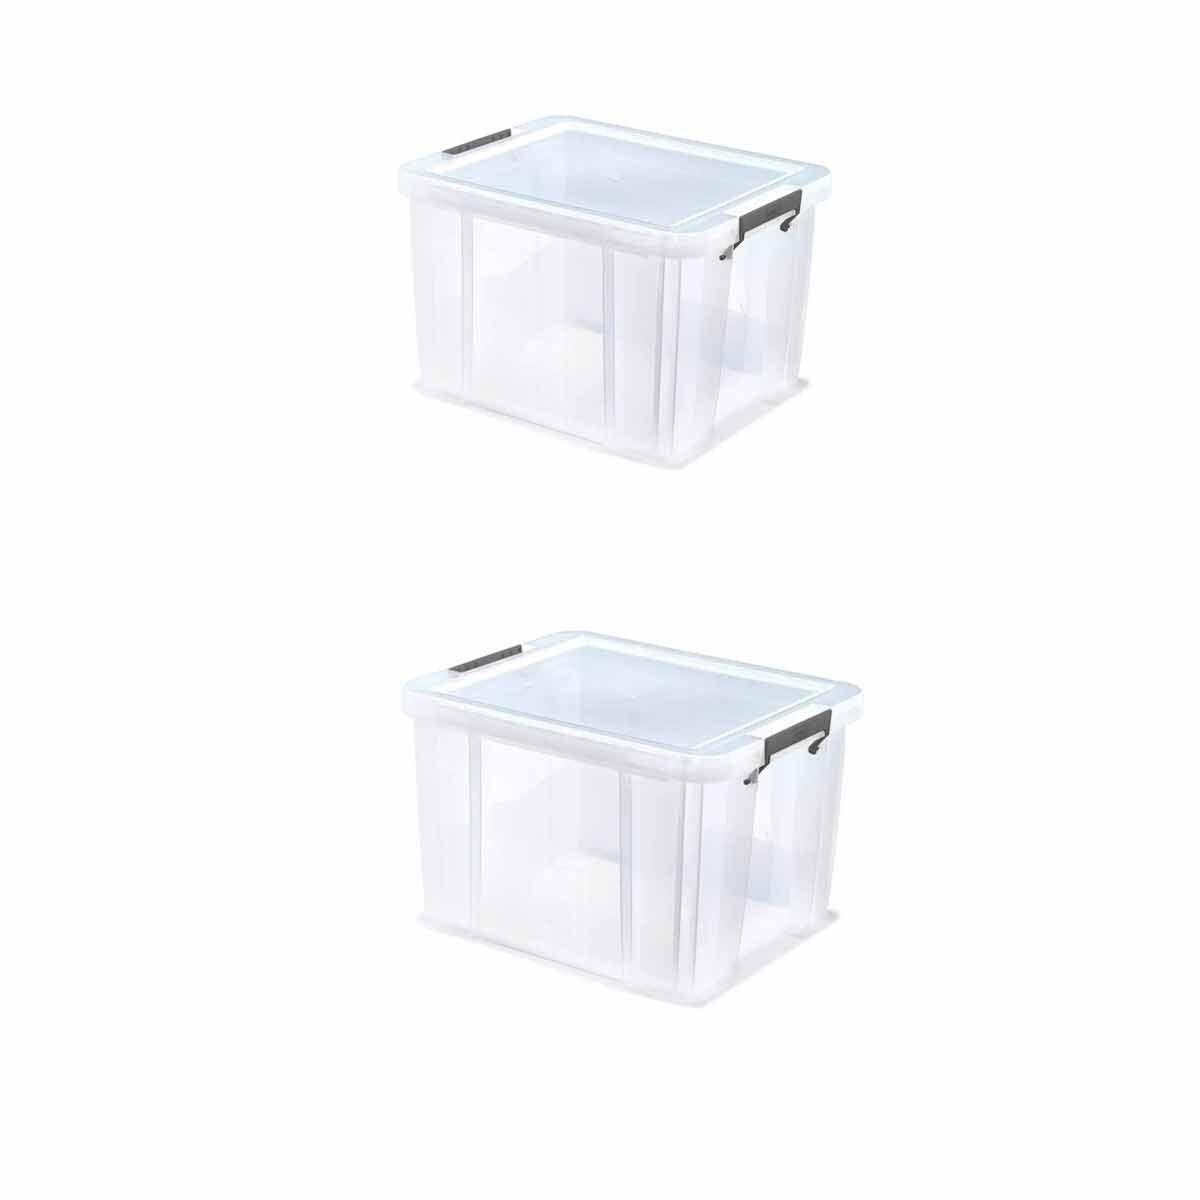 Whitefurze Allstore Plastic Storage Box 36 Litre Pack of 2